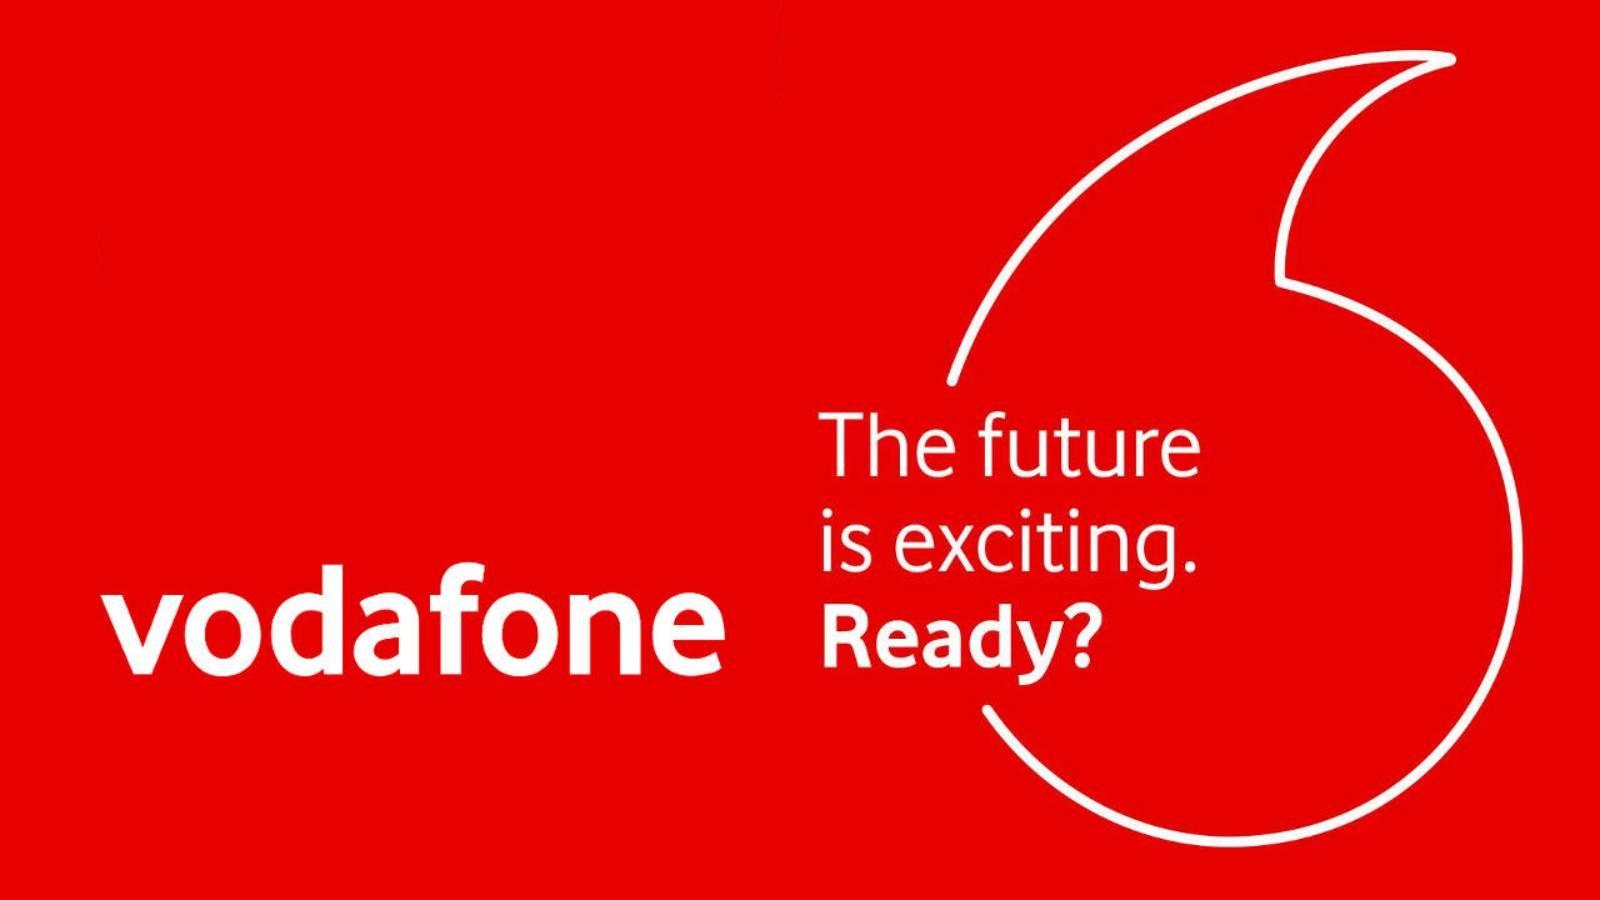 Vodafone upc